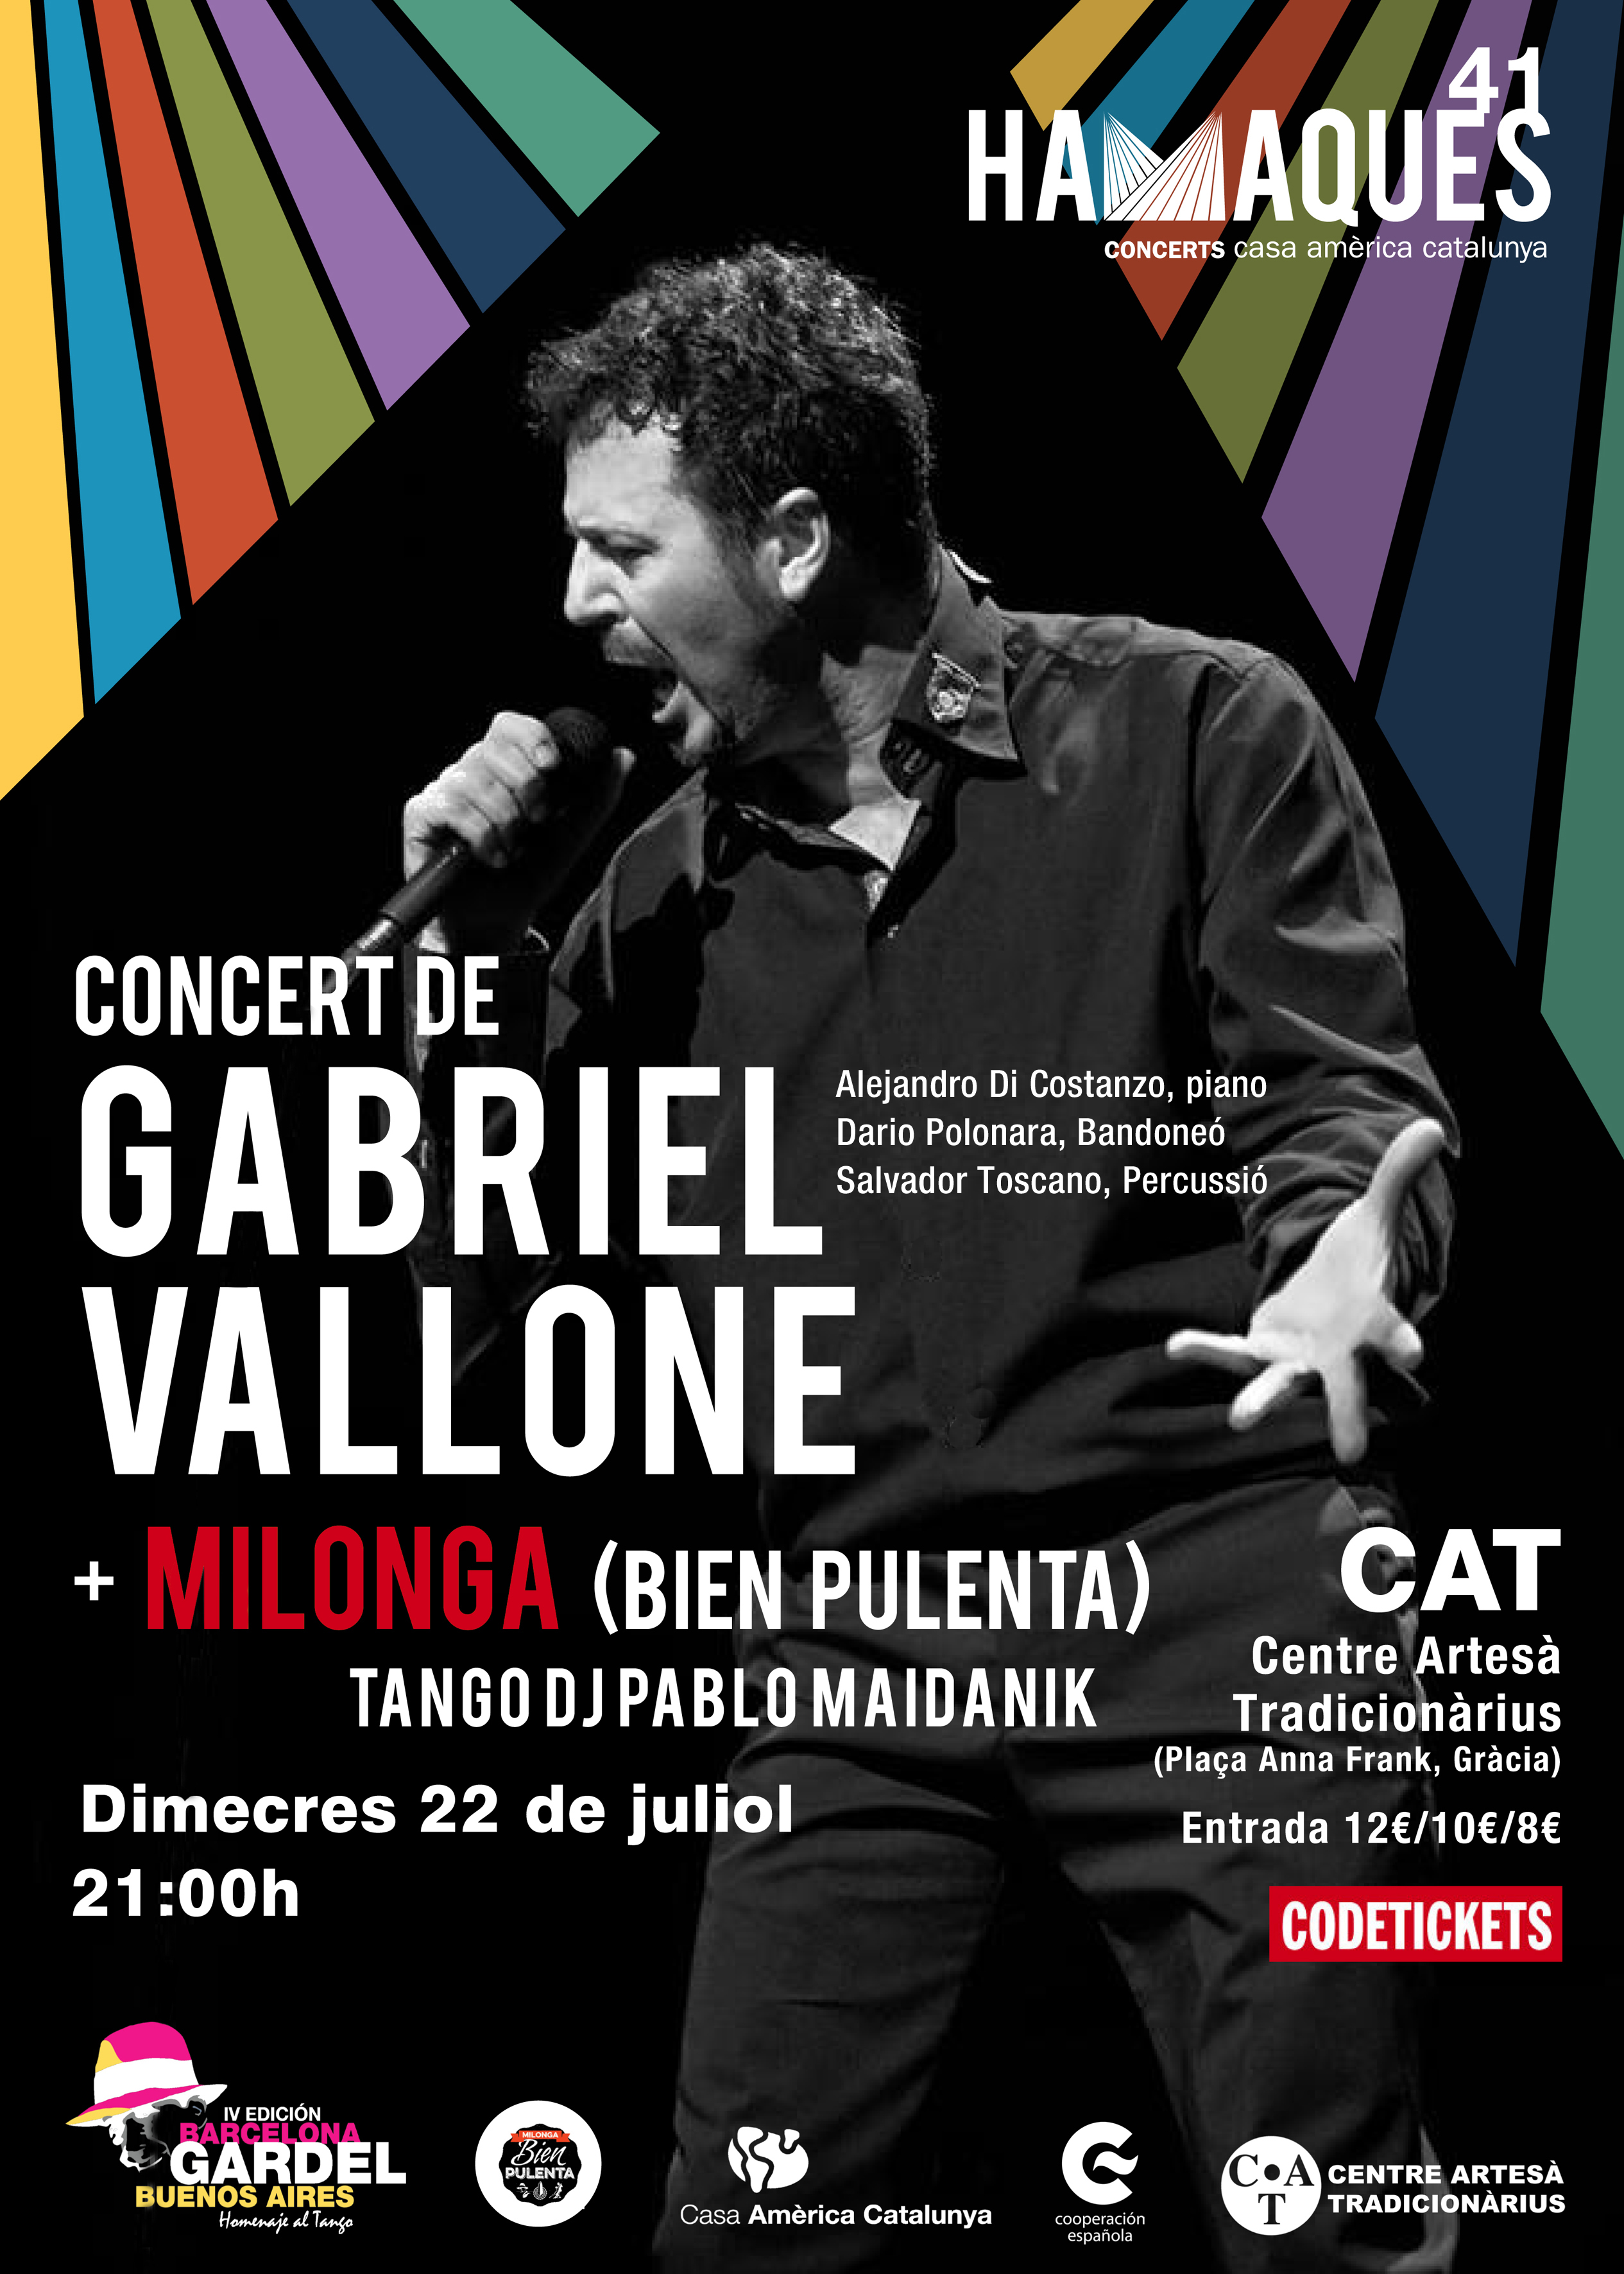 H_GabrielVallone_Milonga_Cartel_web